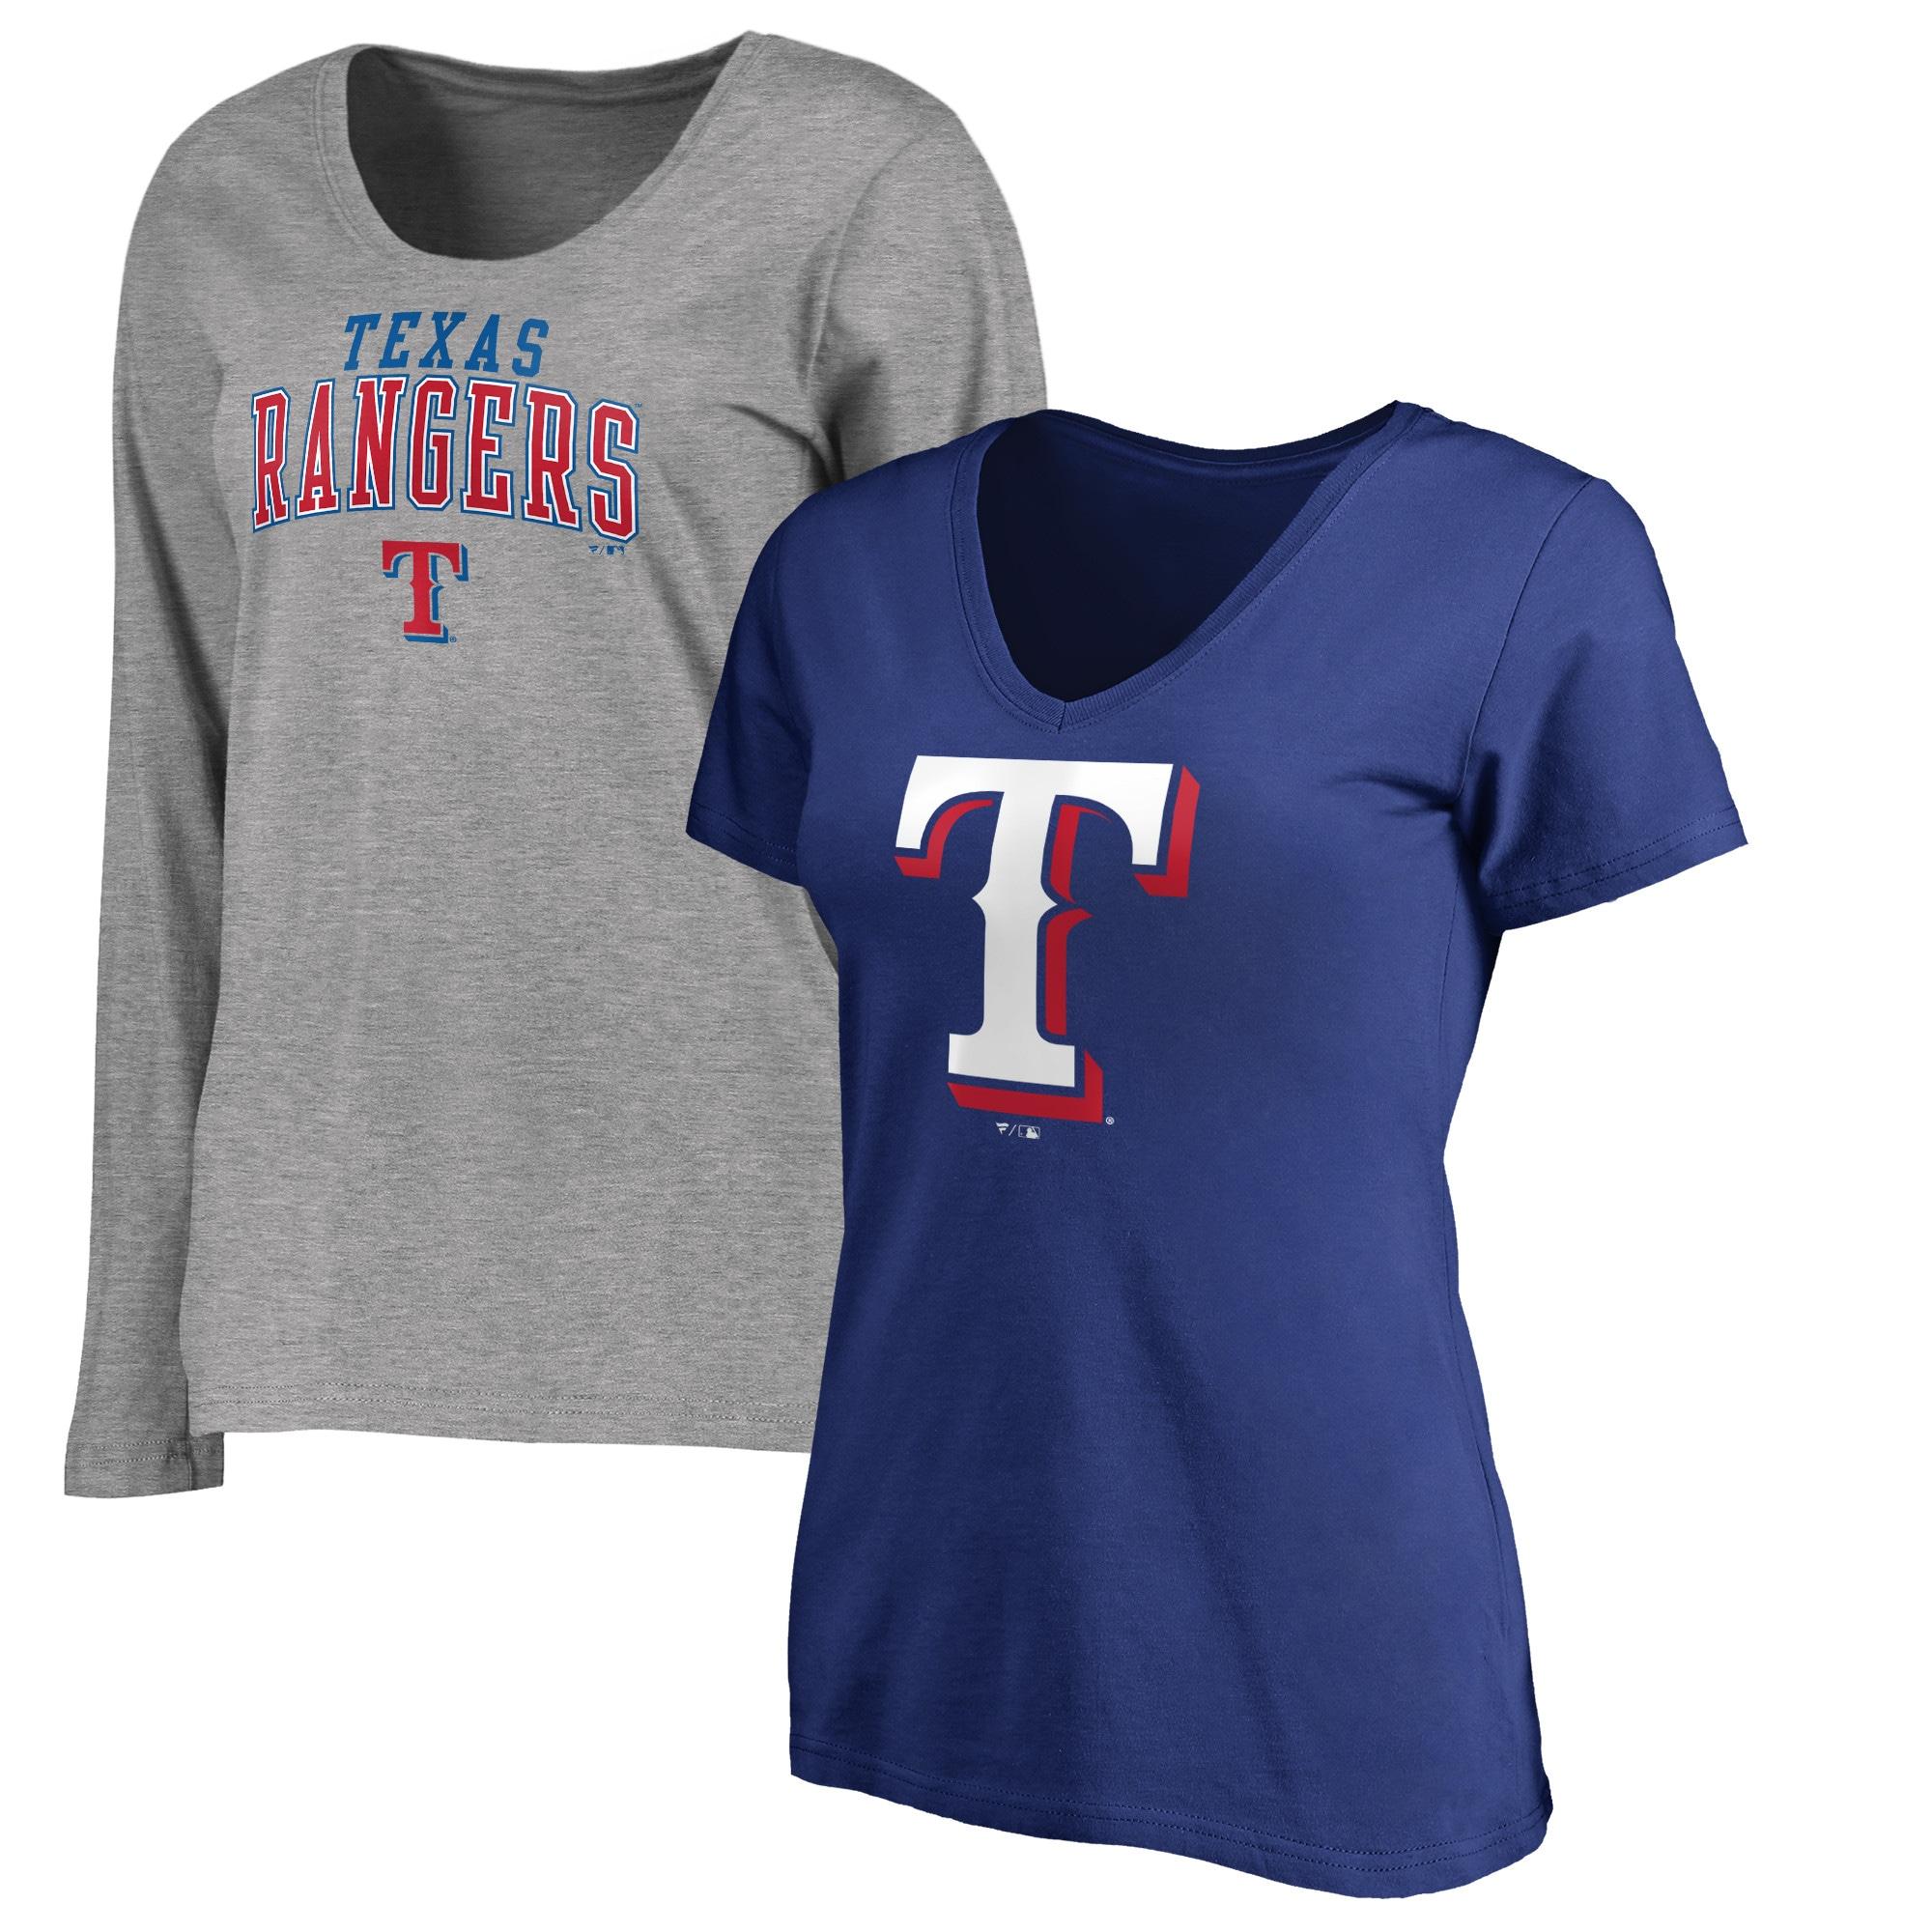 Texas Rangers Fanatics Branded Women's V-Neck T-Shirt Combo Set - Royal/Gray